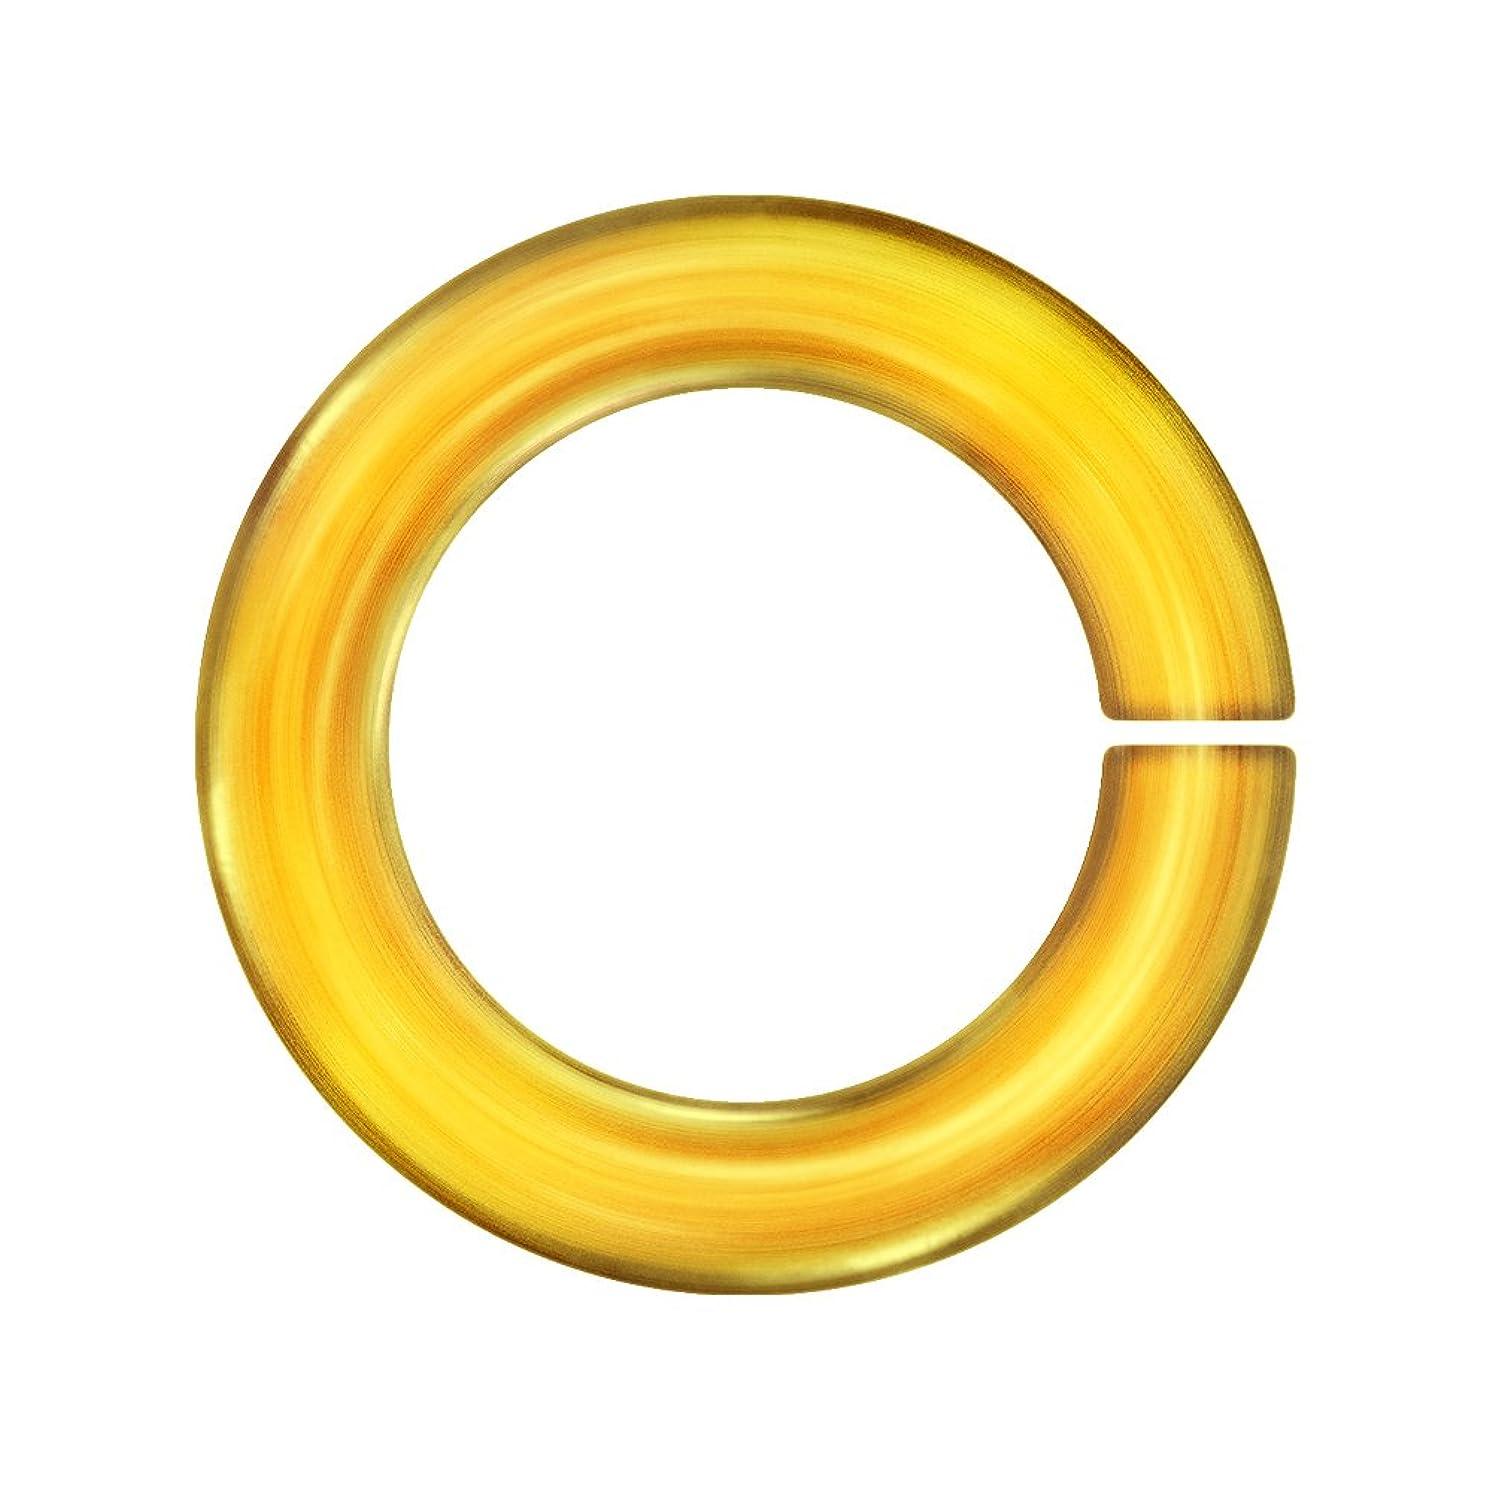 Weave Got Maille 18-Gauge 4.5mm Honey Anodized Aluminum Jump Rings - 100 Pieces